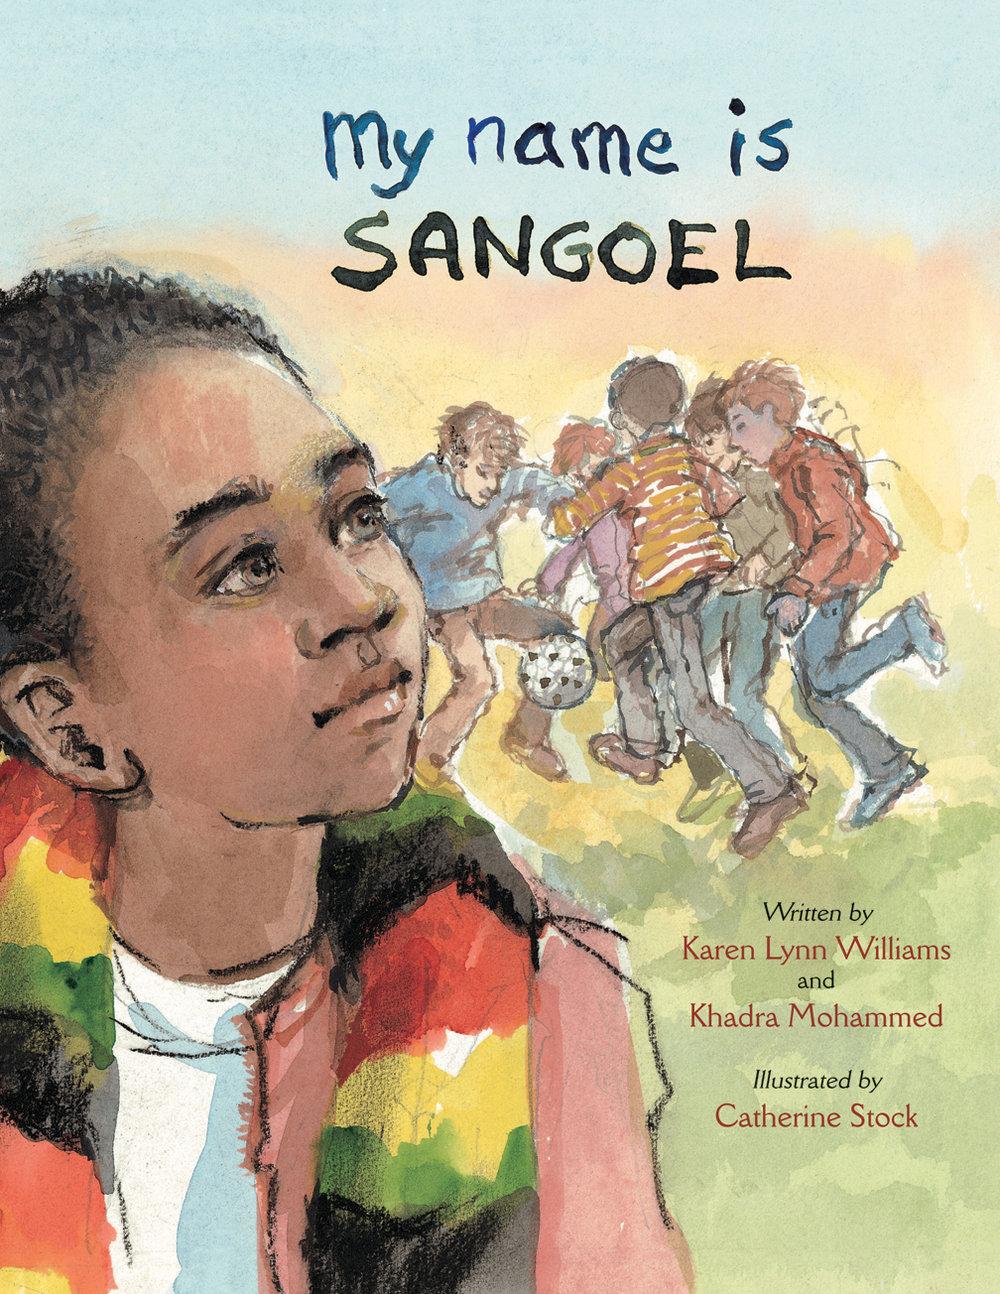 My Name is Sangoel, by Karen Lynn Williams and Khadra Mohammed